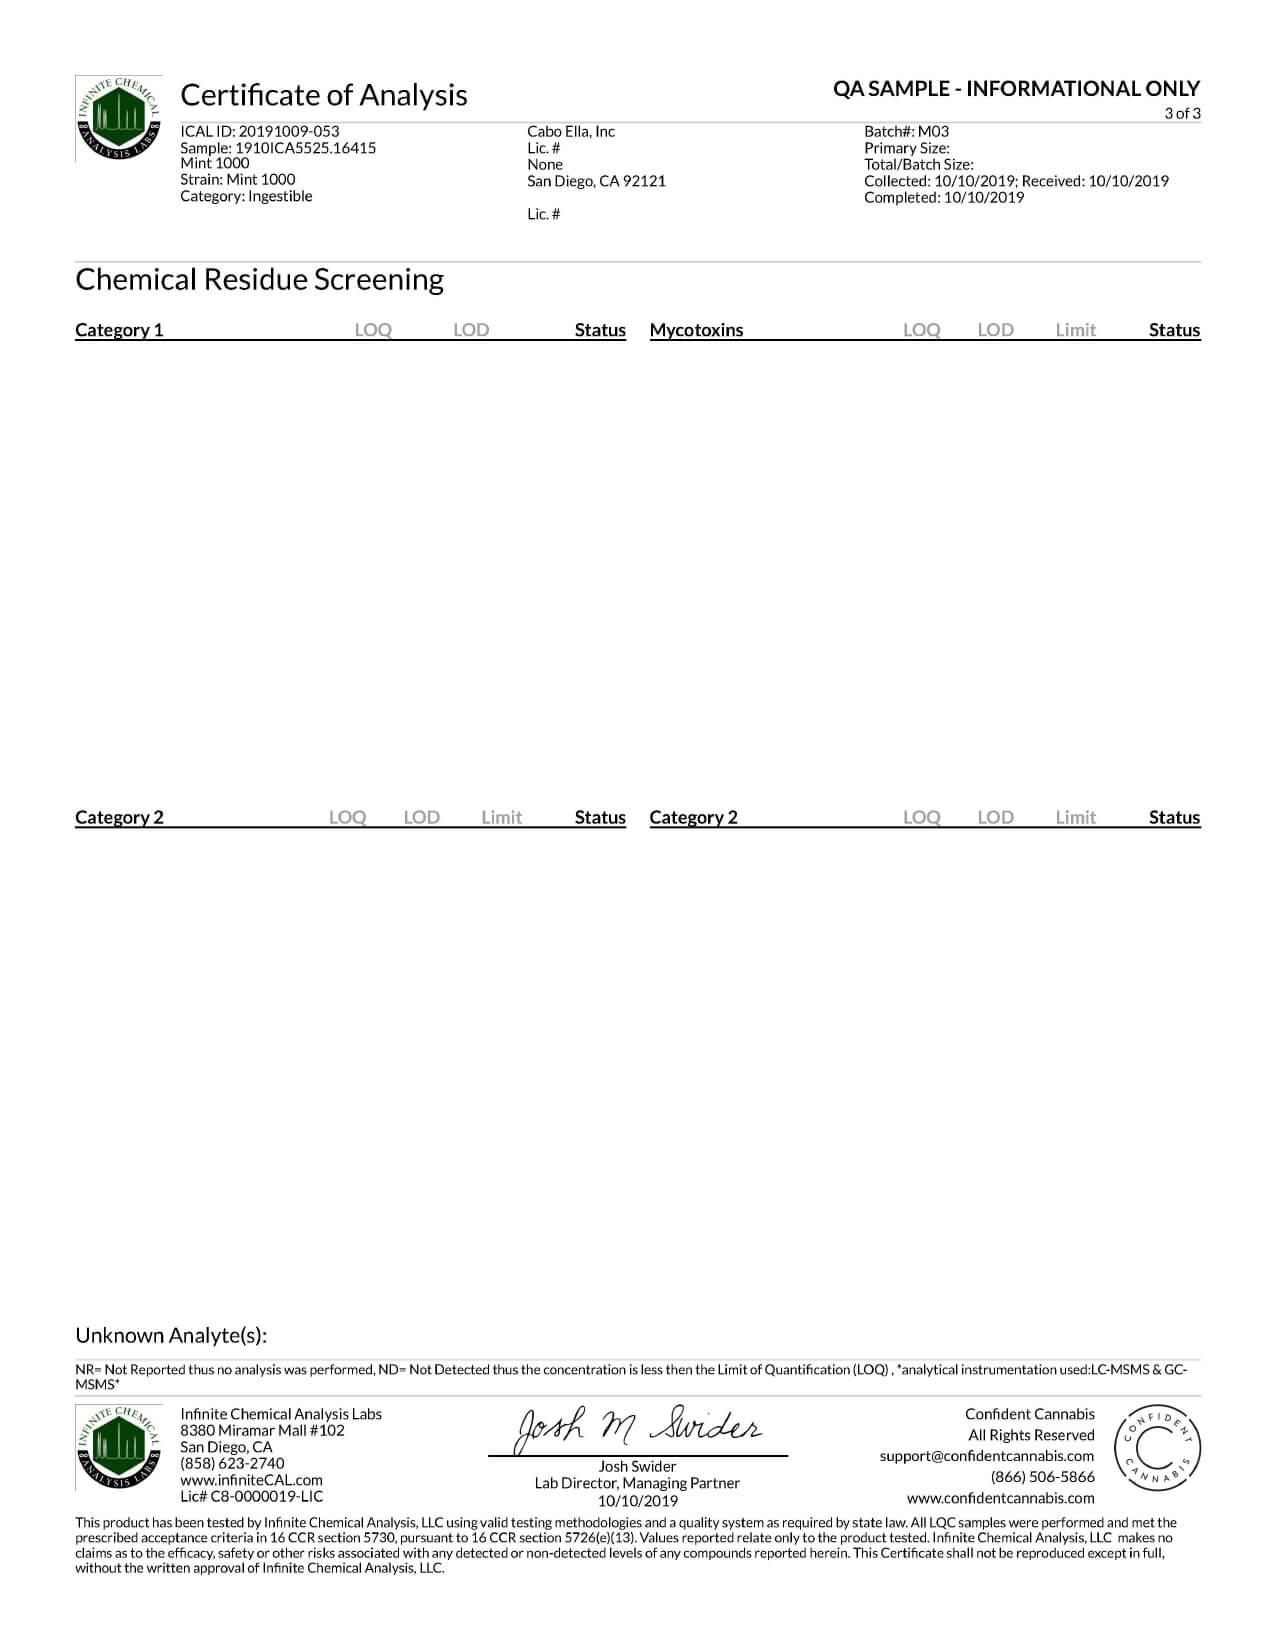 Smilyn CBD Tincture Mint 1000mg Lab Report